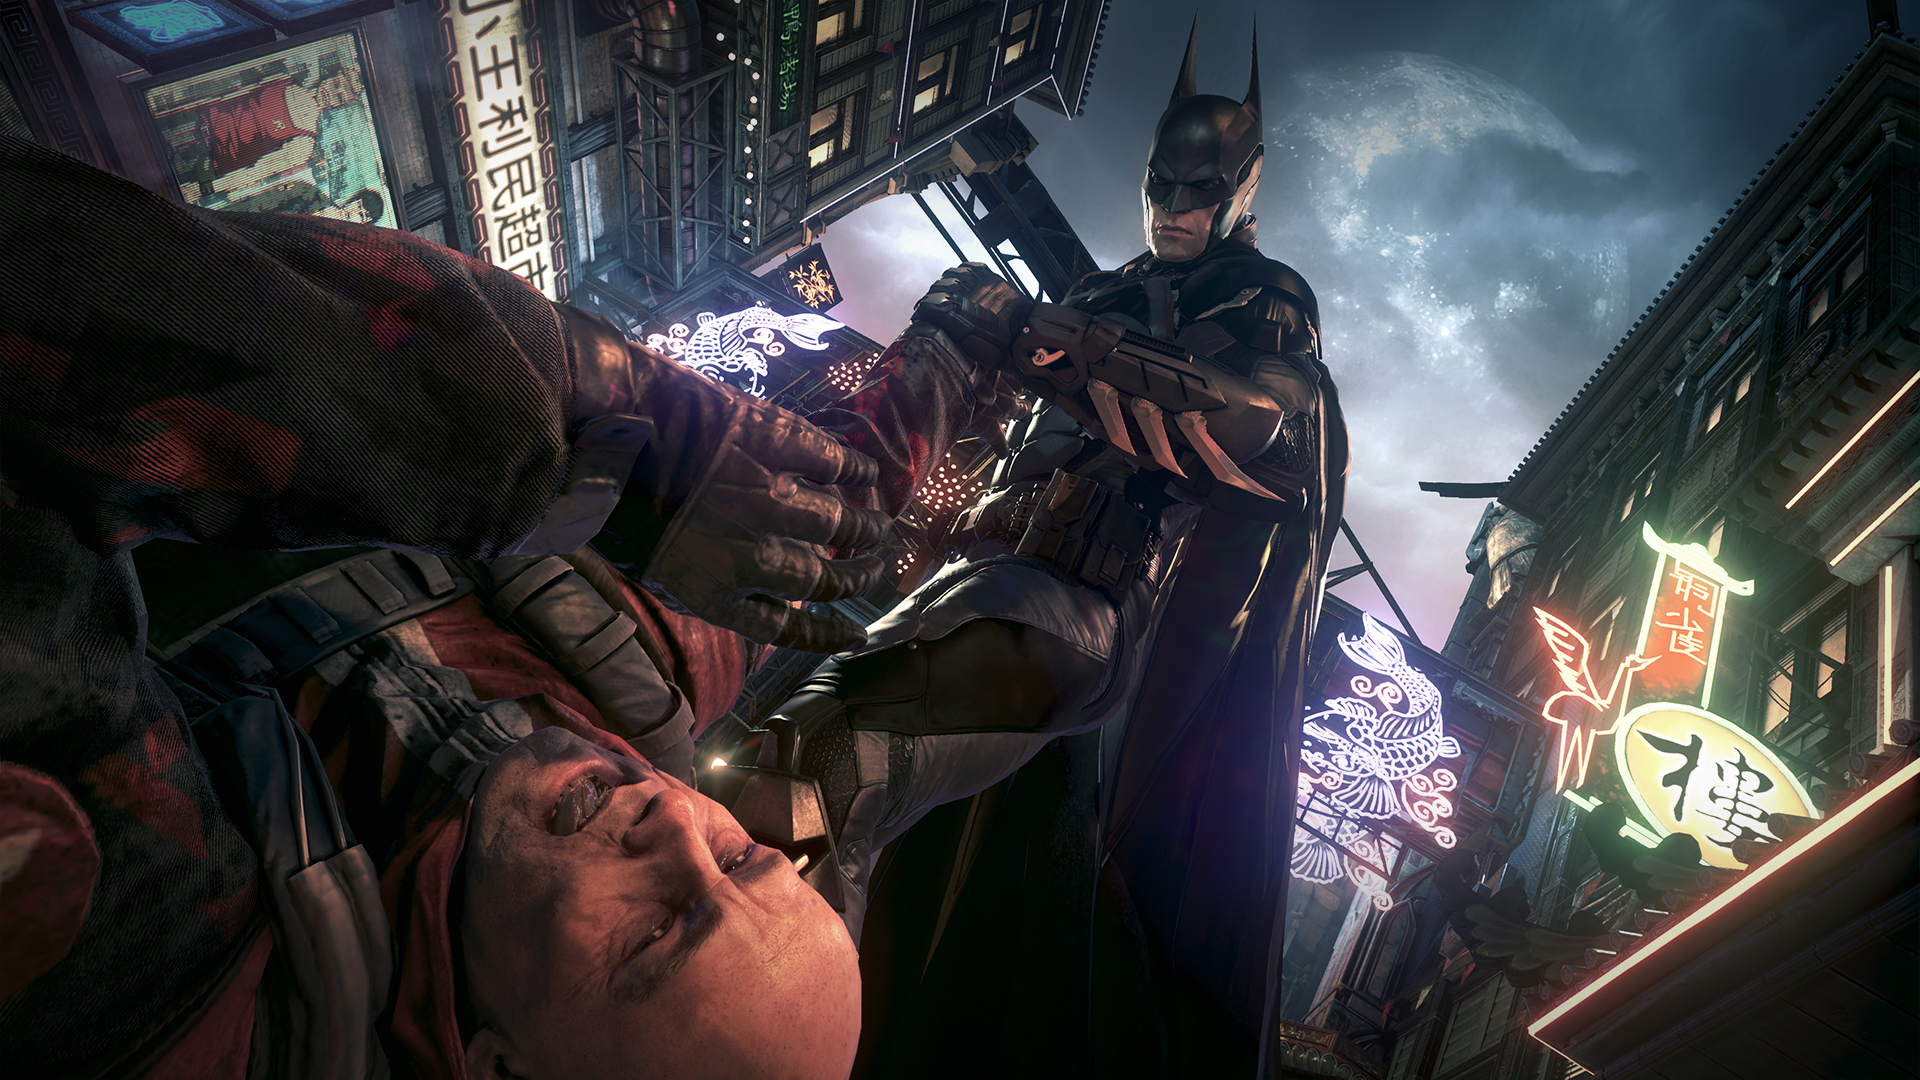 batman arkham knight game hd 1920x1080 1080p wallpaper and compatible ...